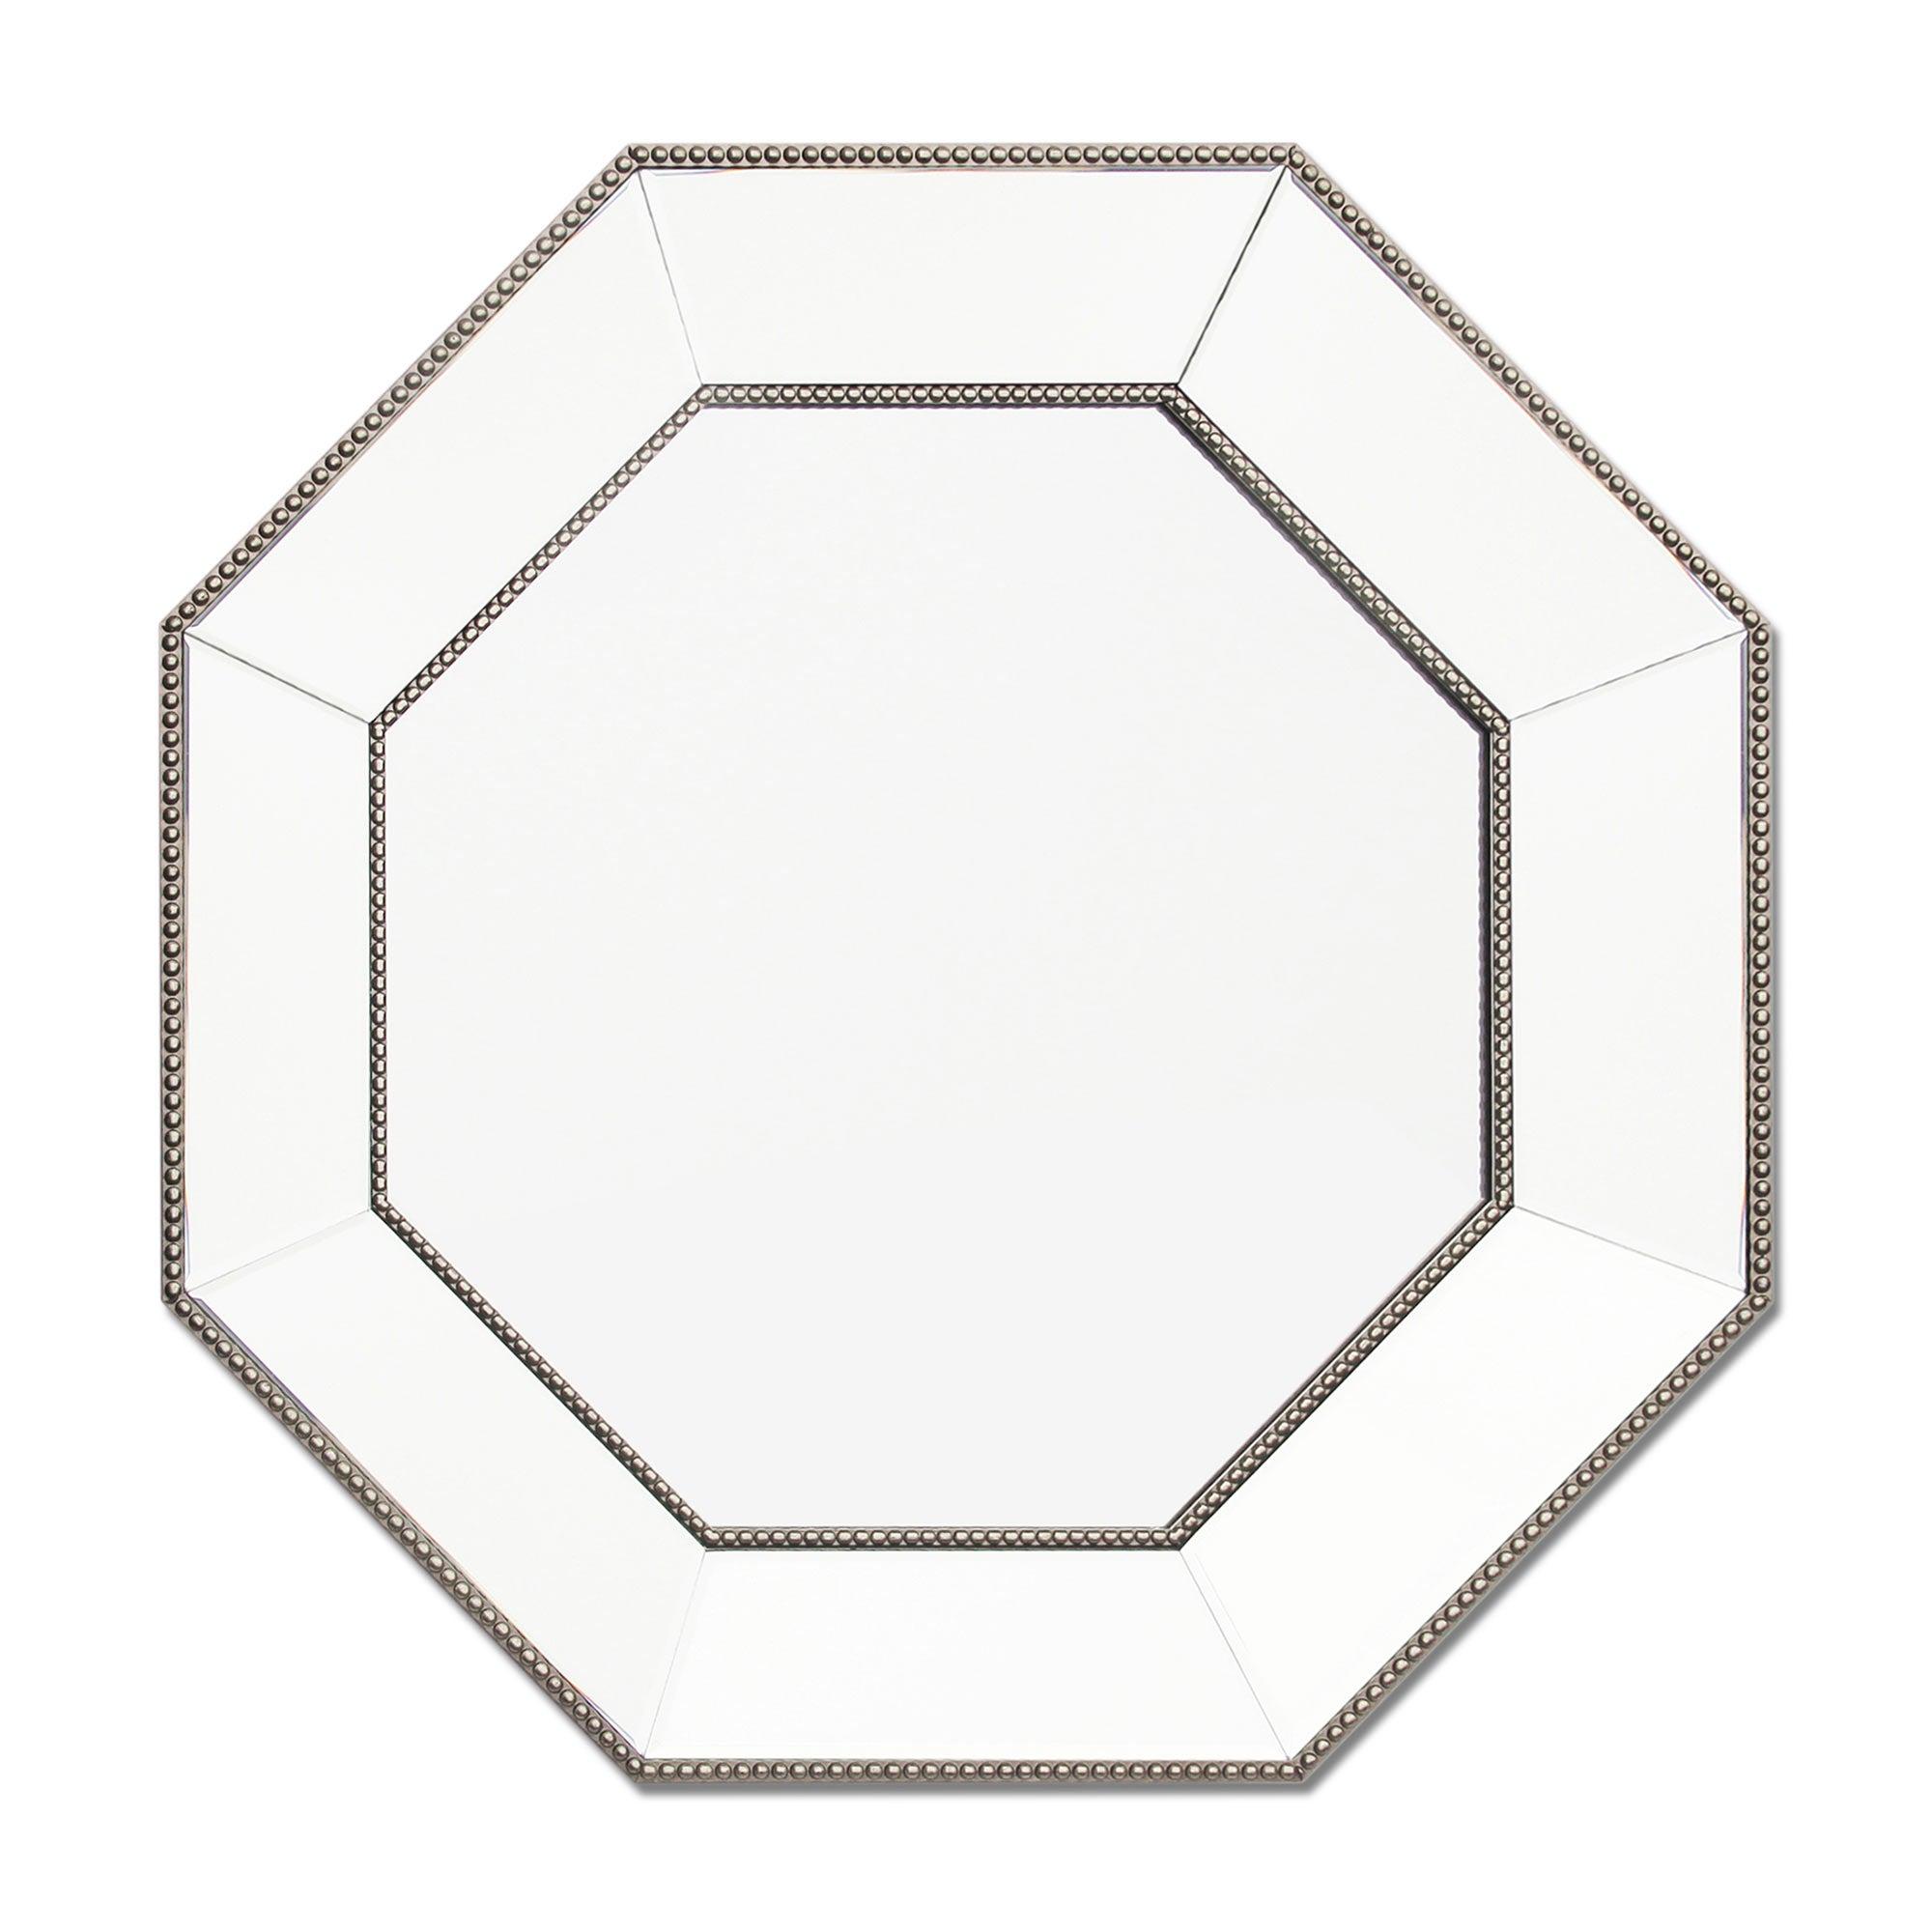 Photo of Dorma beaded edge octagonal mirror silver